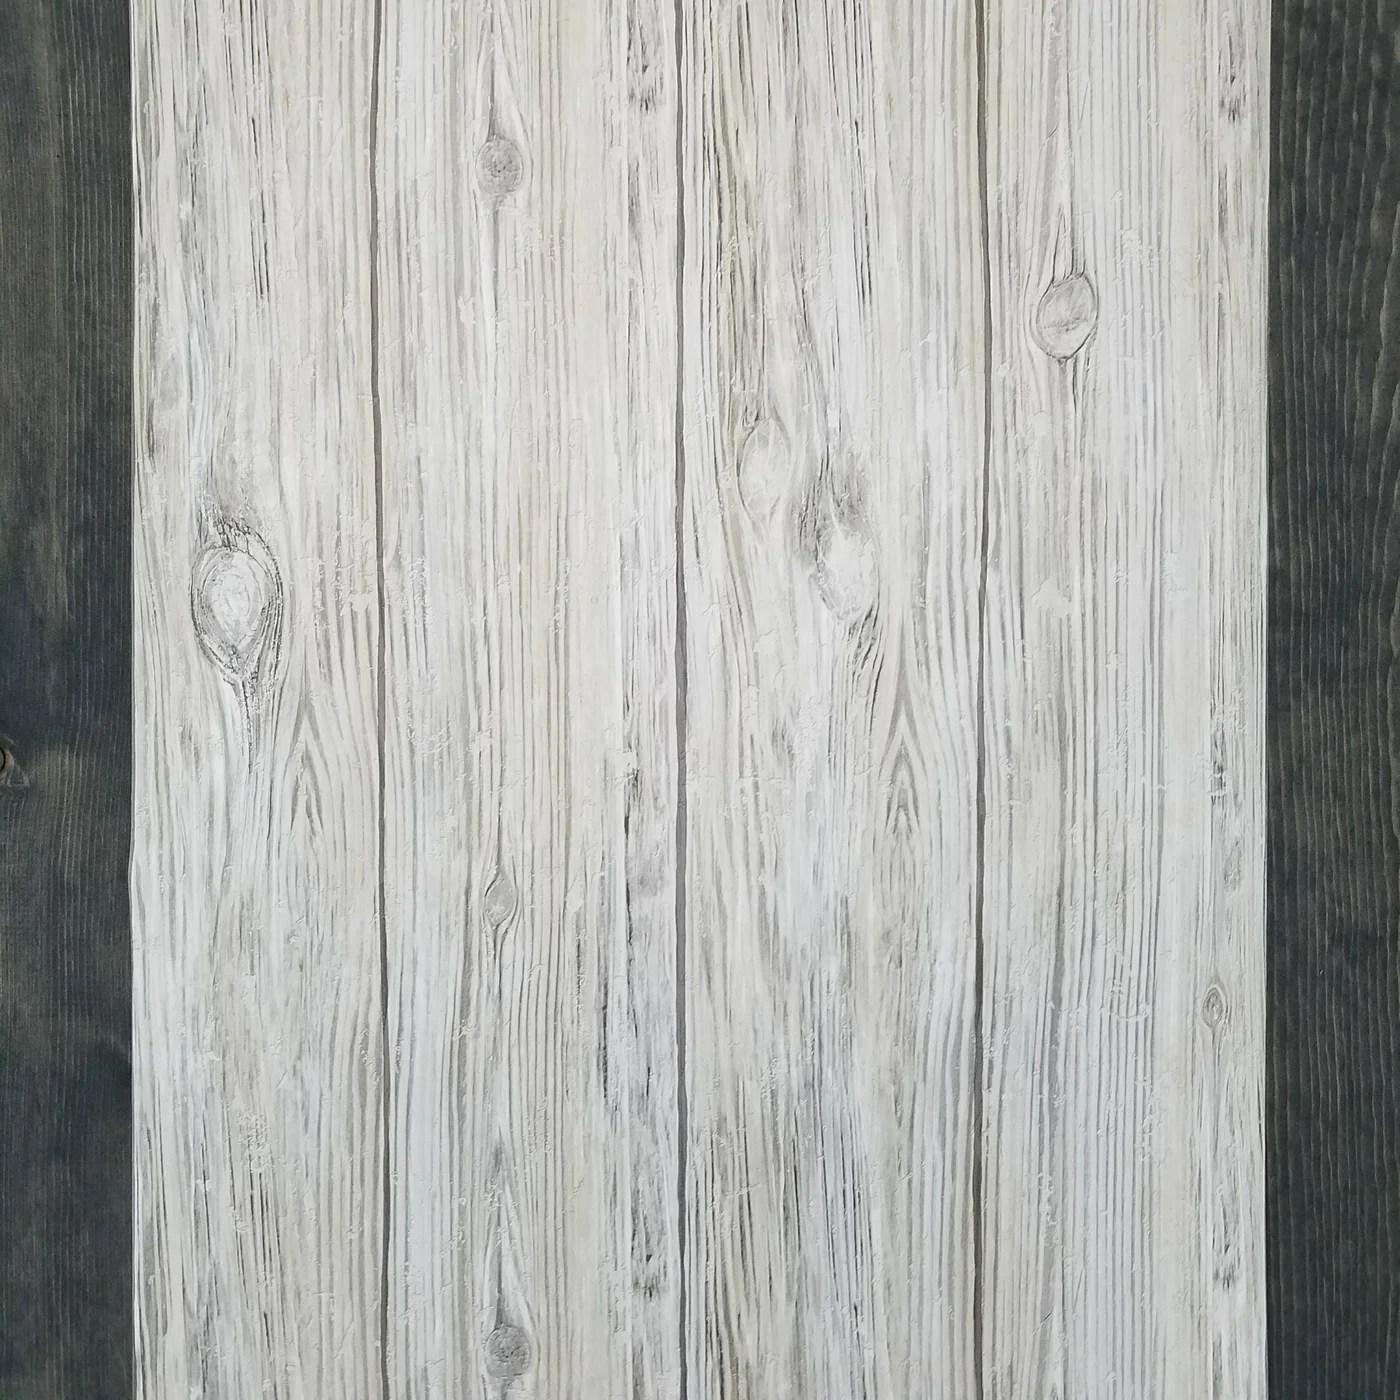 Gray Distressed Shiplap Rustic Wood Peel and Stick Wallpaper | RMK9086WP – D. Marie Interiors